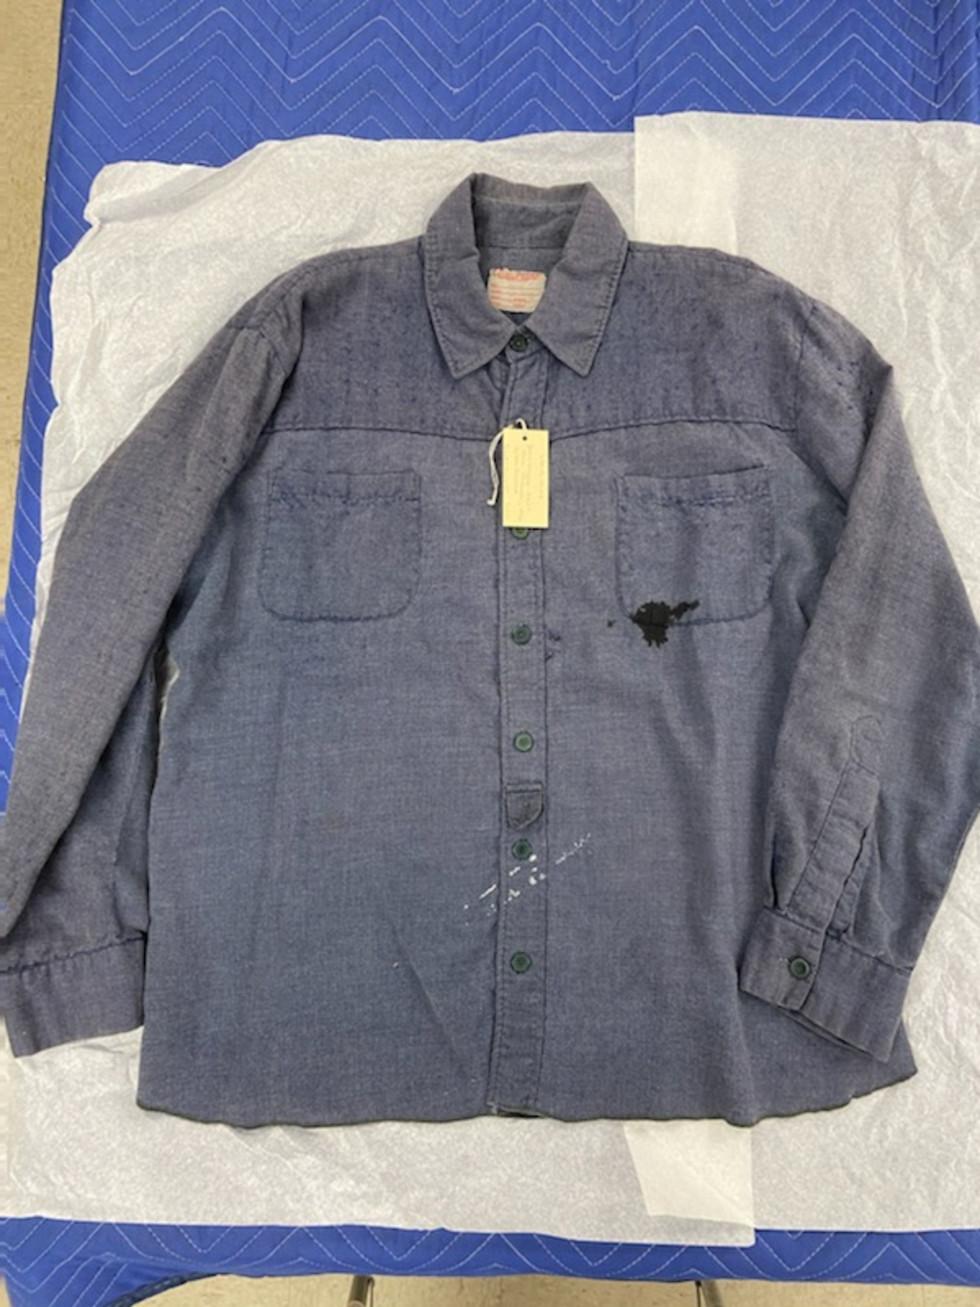 John Wayne's Chisum shirt